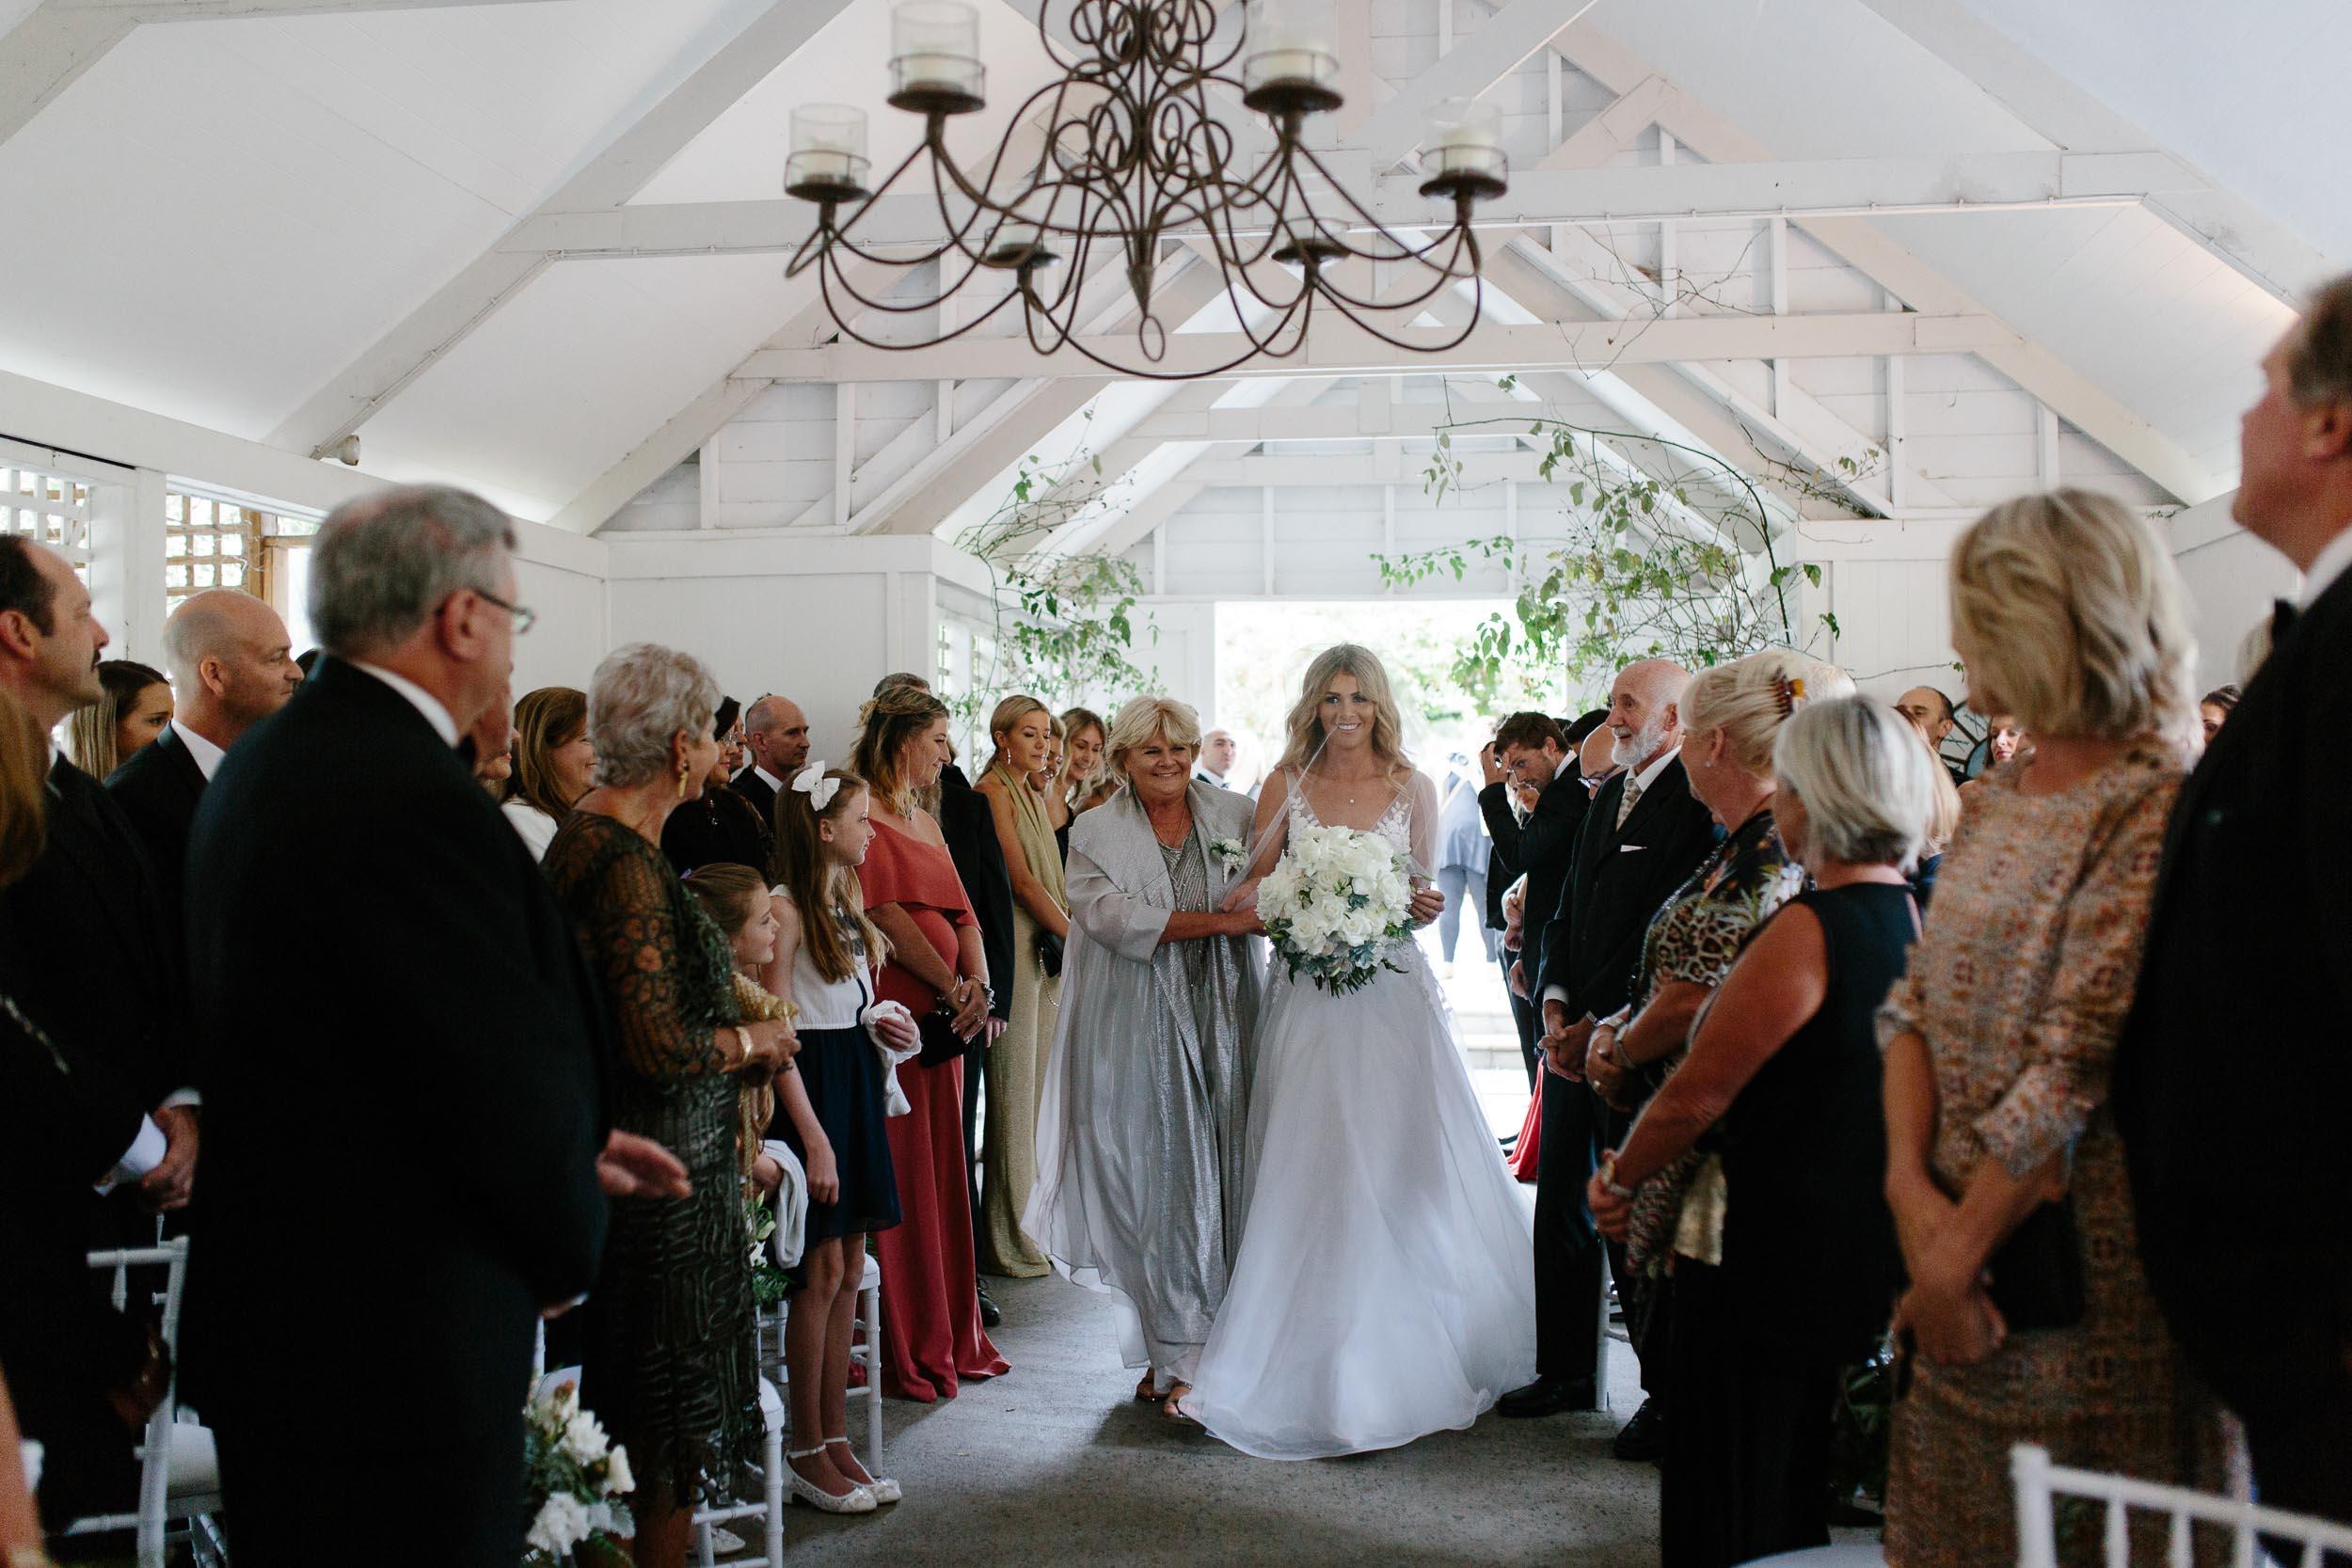 Kas-Richards-Mornington-Peninsula-Private-Property-Wedding-Marianna-Hardwick-Gown-231.jpg